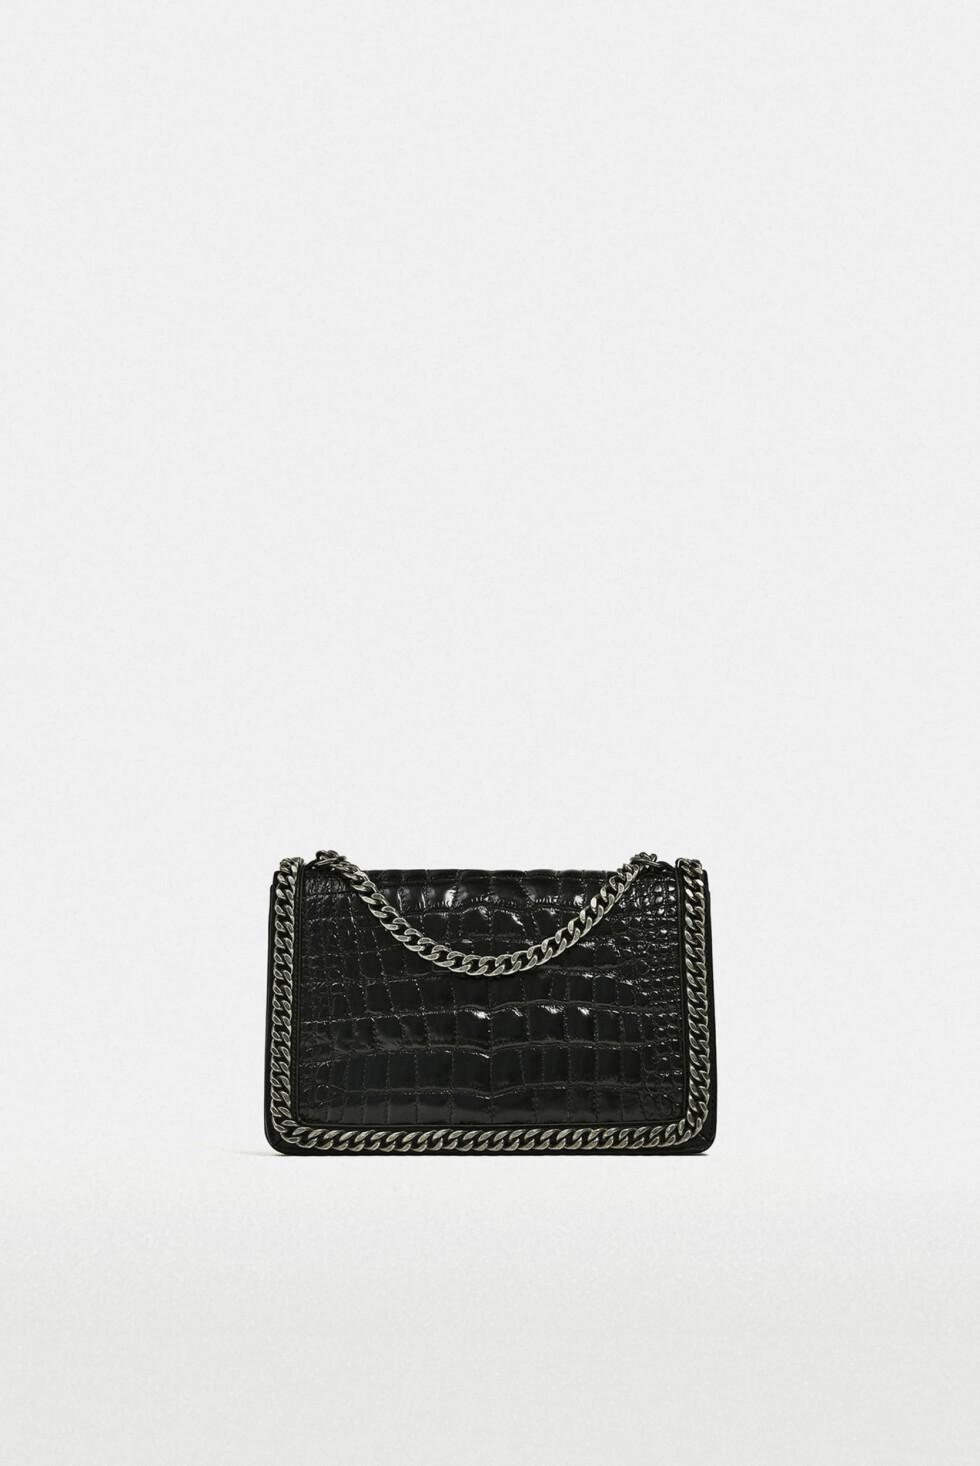 Zara, kr 960